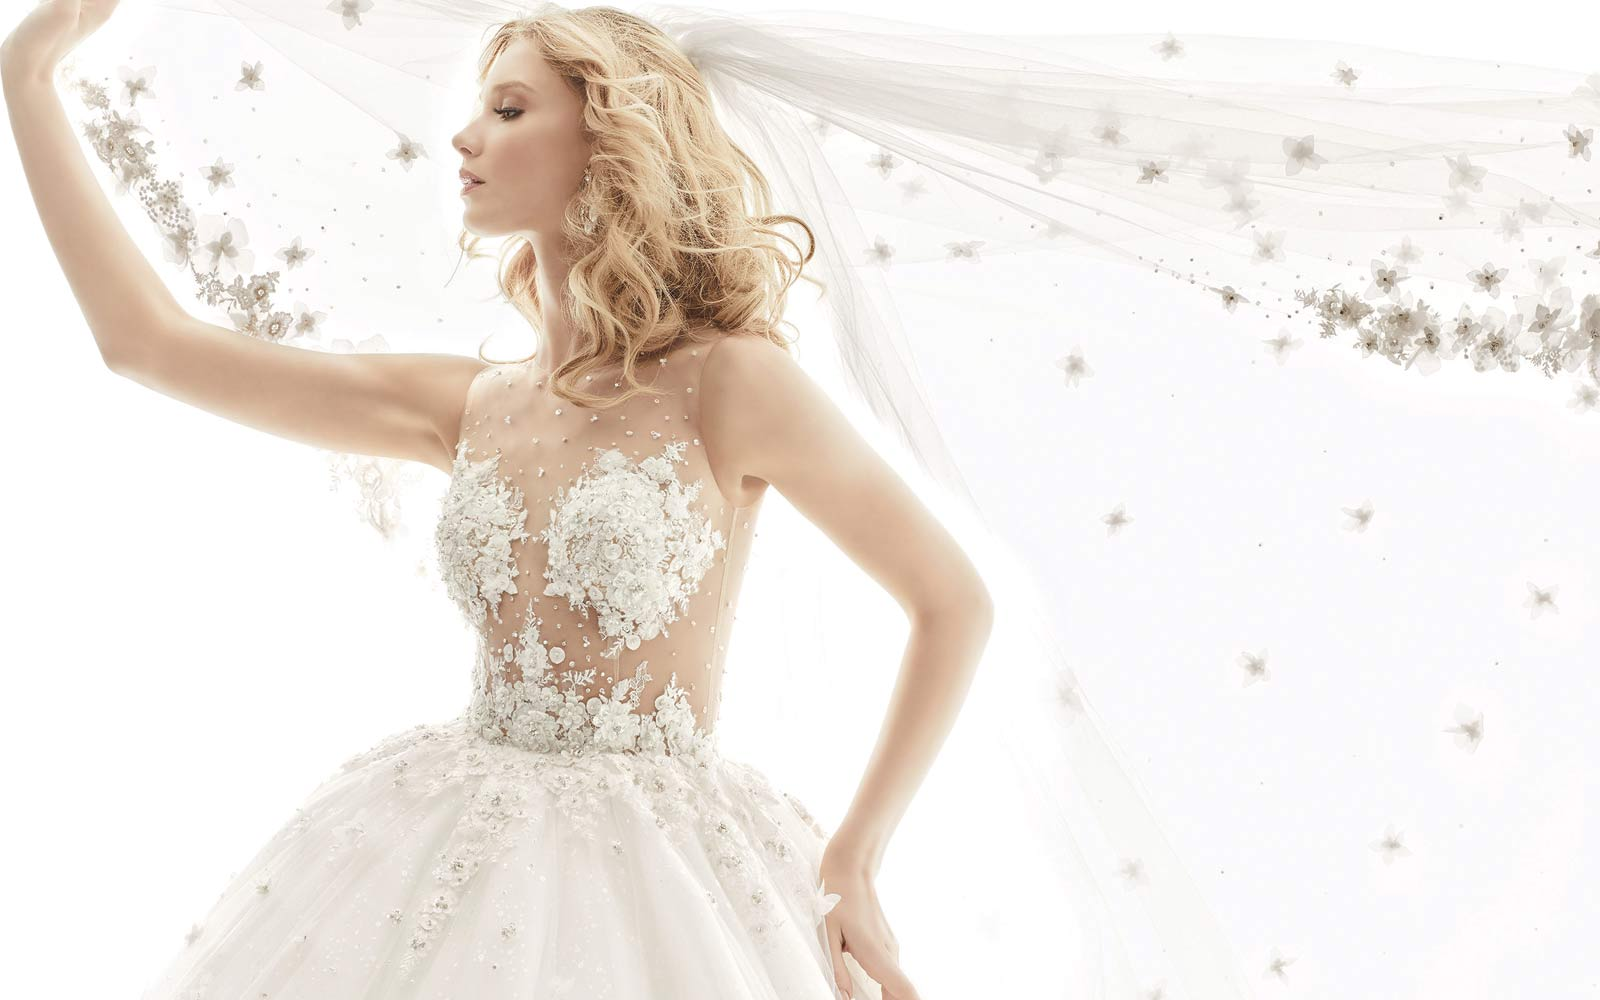 Brickhouse Bridal - Randy Fenoli Debut Trunk Show - Houston Wedding Dress Boutique